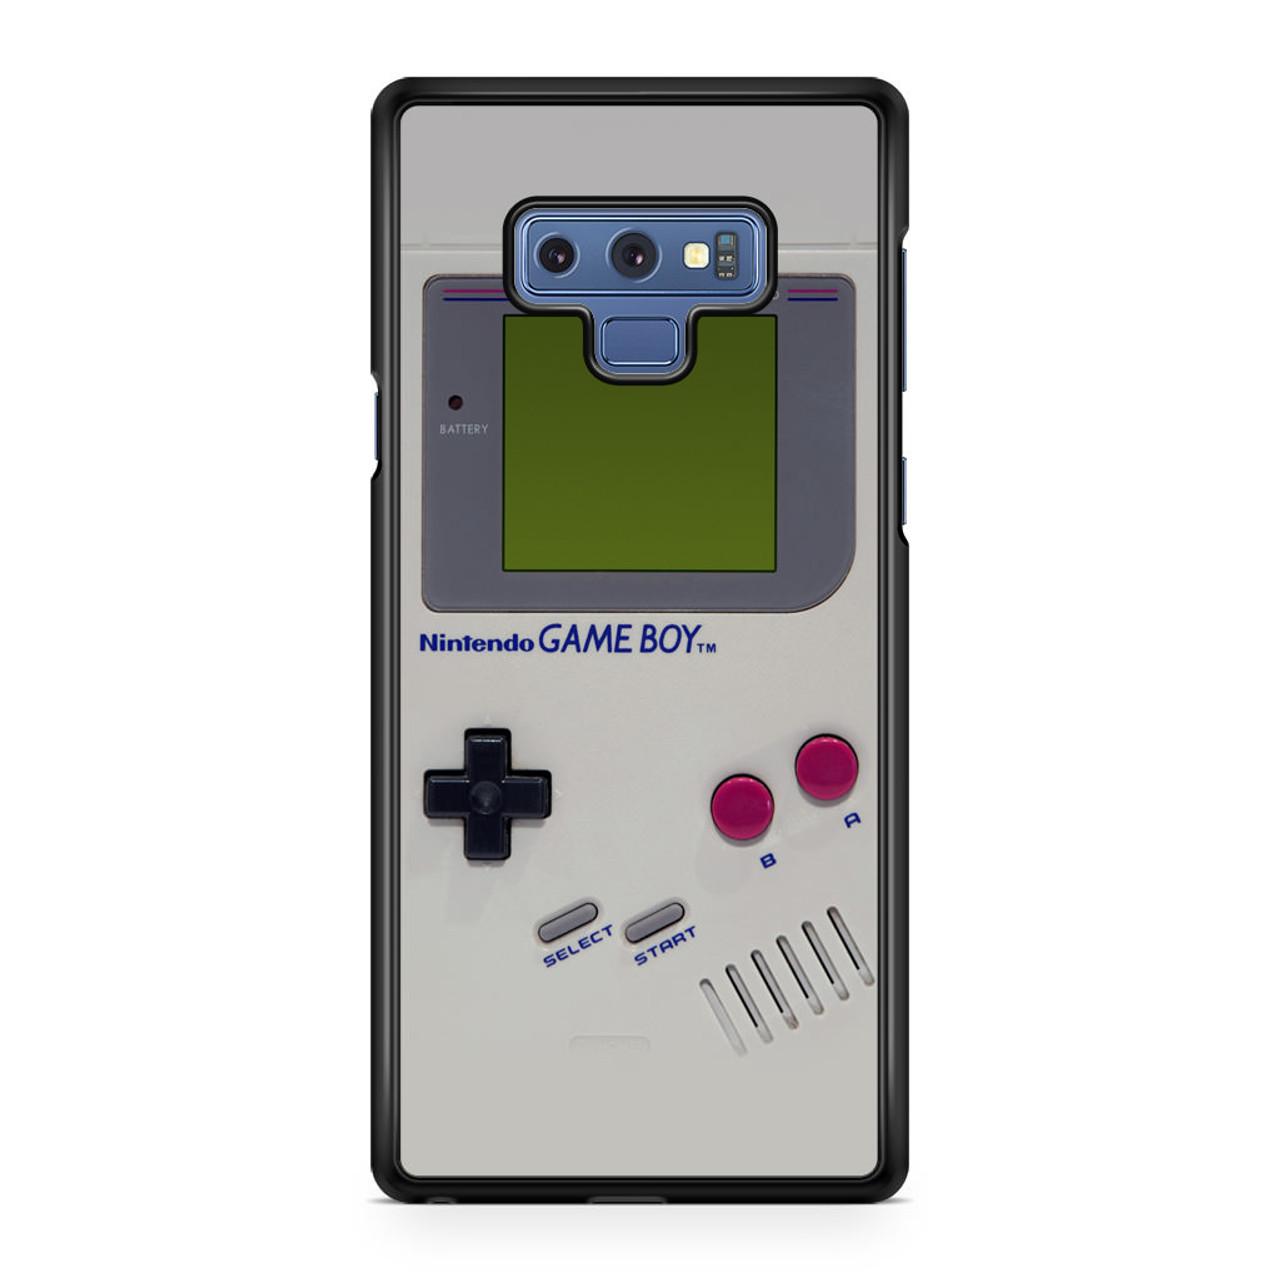 half off 5a26f fdb99 Retro Gameboy Nintendo Samsung Galaxy Note 9 Case